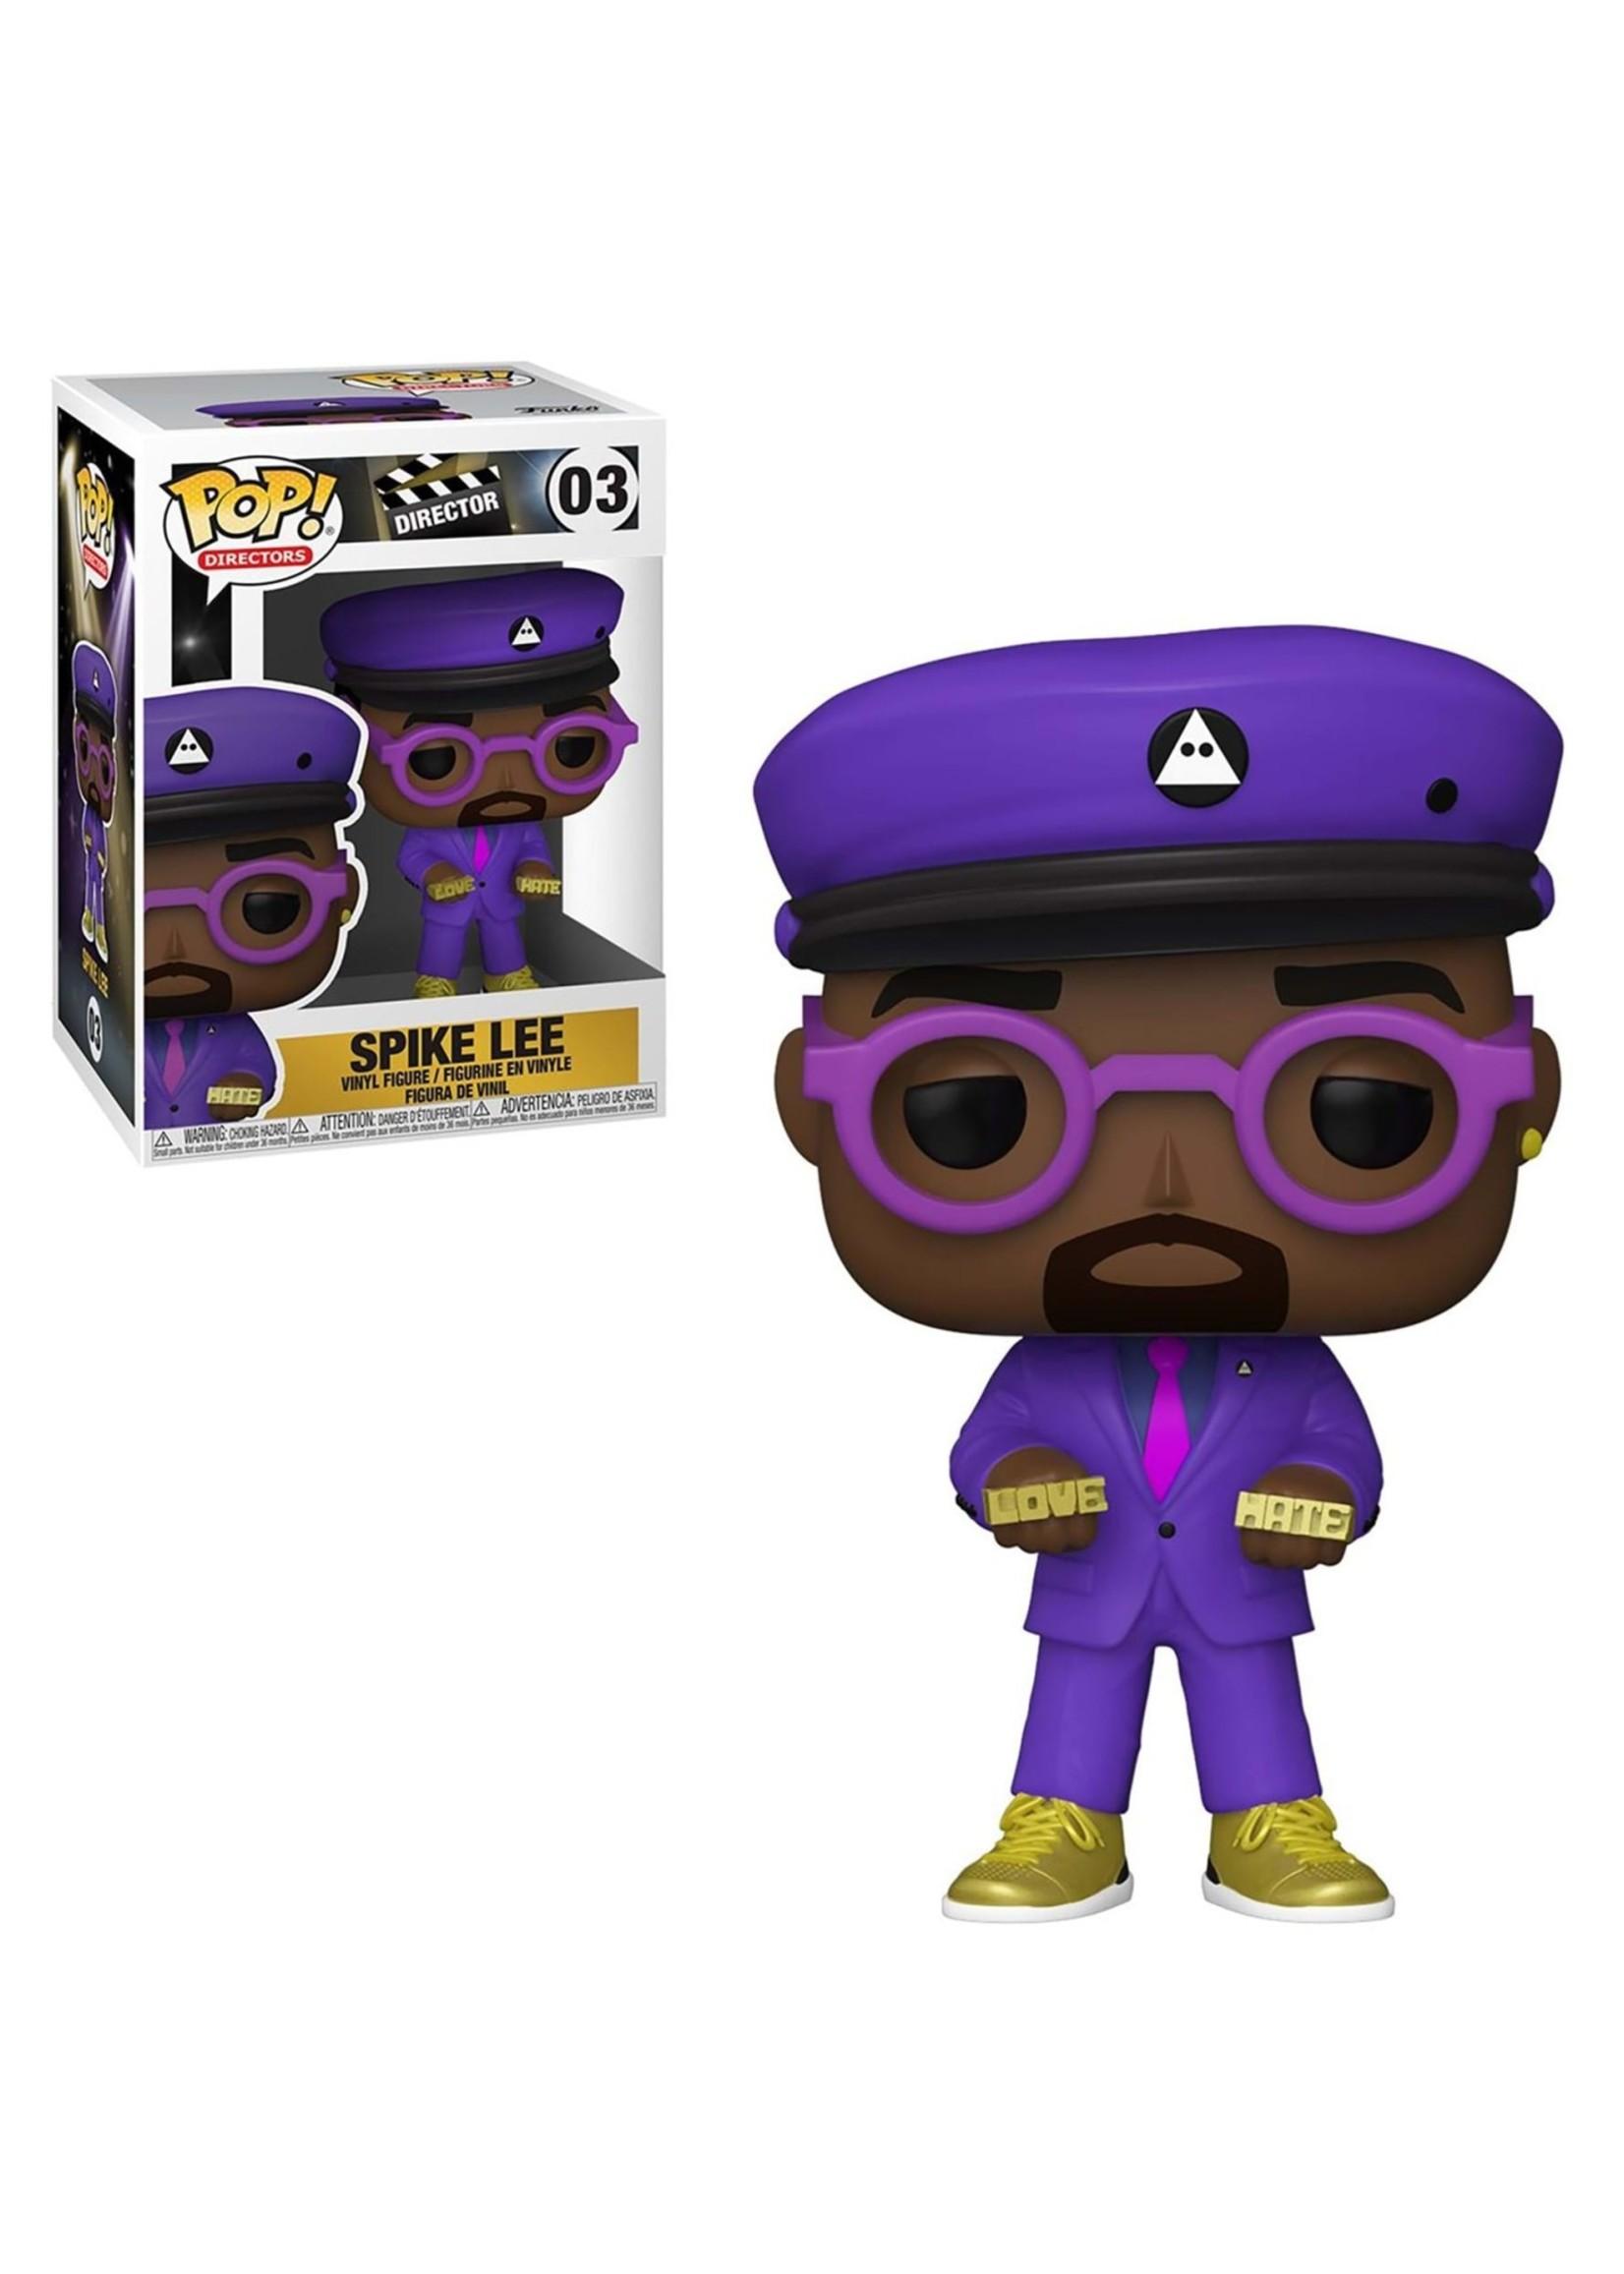 Funko POP Directors Spike Lee (Purple Suit)